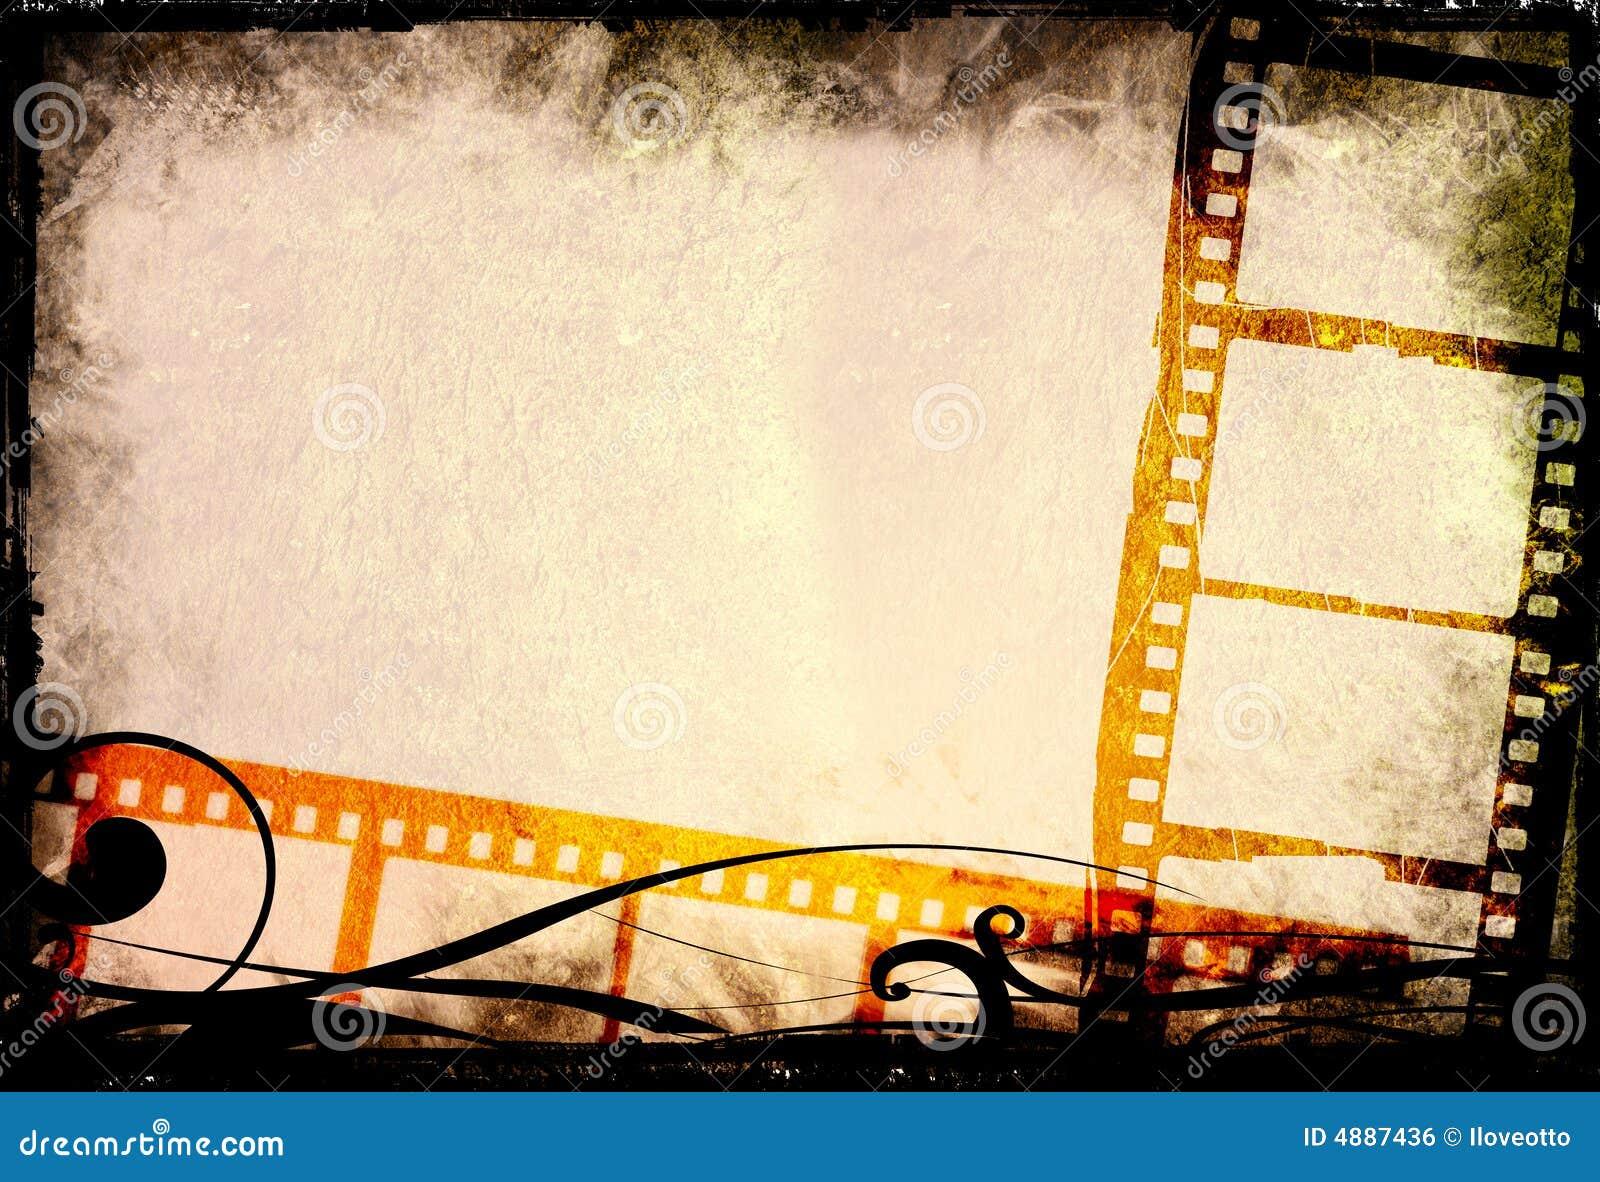 Grunge Film Strip Backgrounds Stock Illustration  Illustration of border, background: 4887436